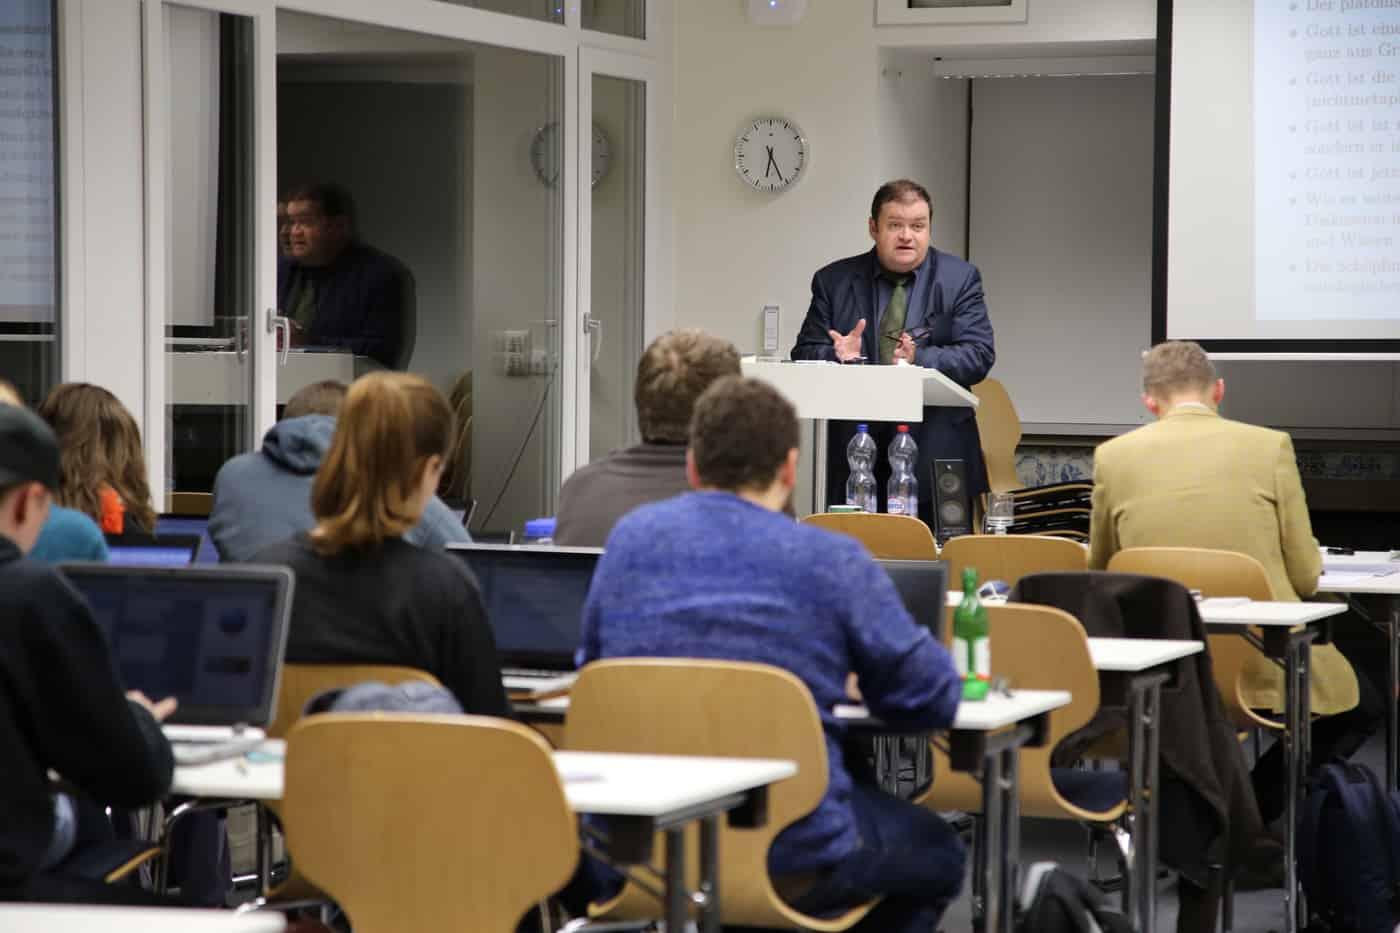 Sth Basel Argumentationstraining 2018 8